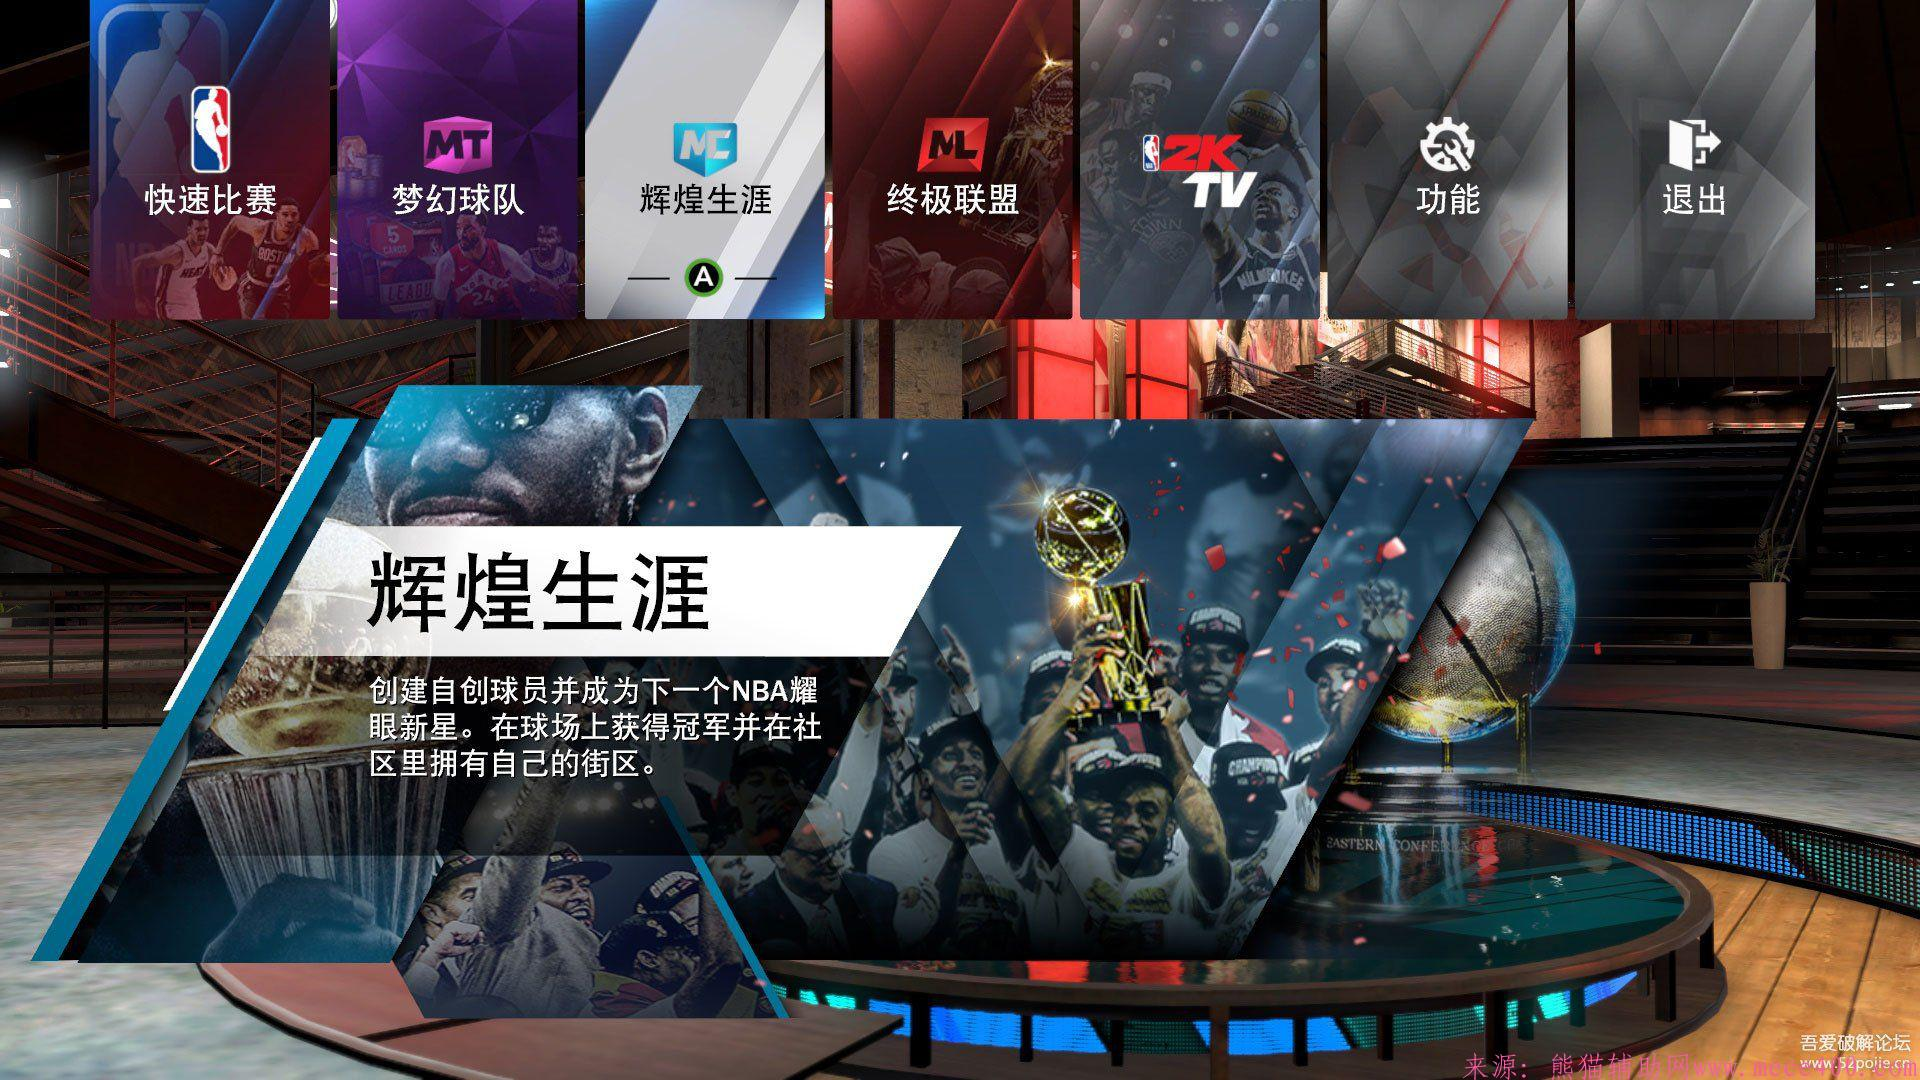 NBA2K20 绿色免安装中文版 解压即玩 解锁生涯模式 整合修改器